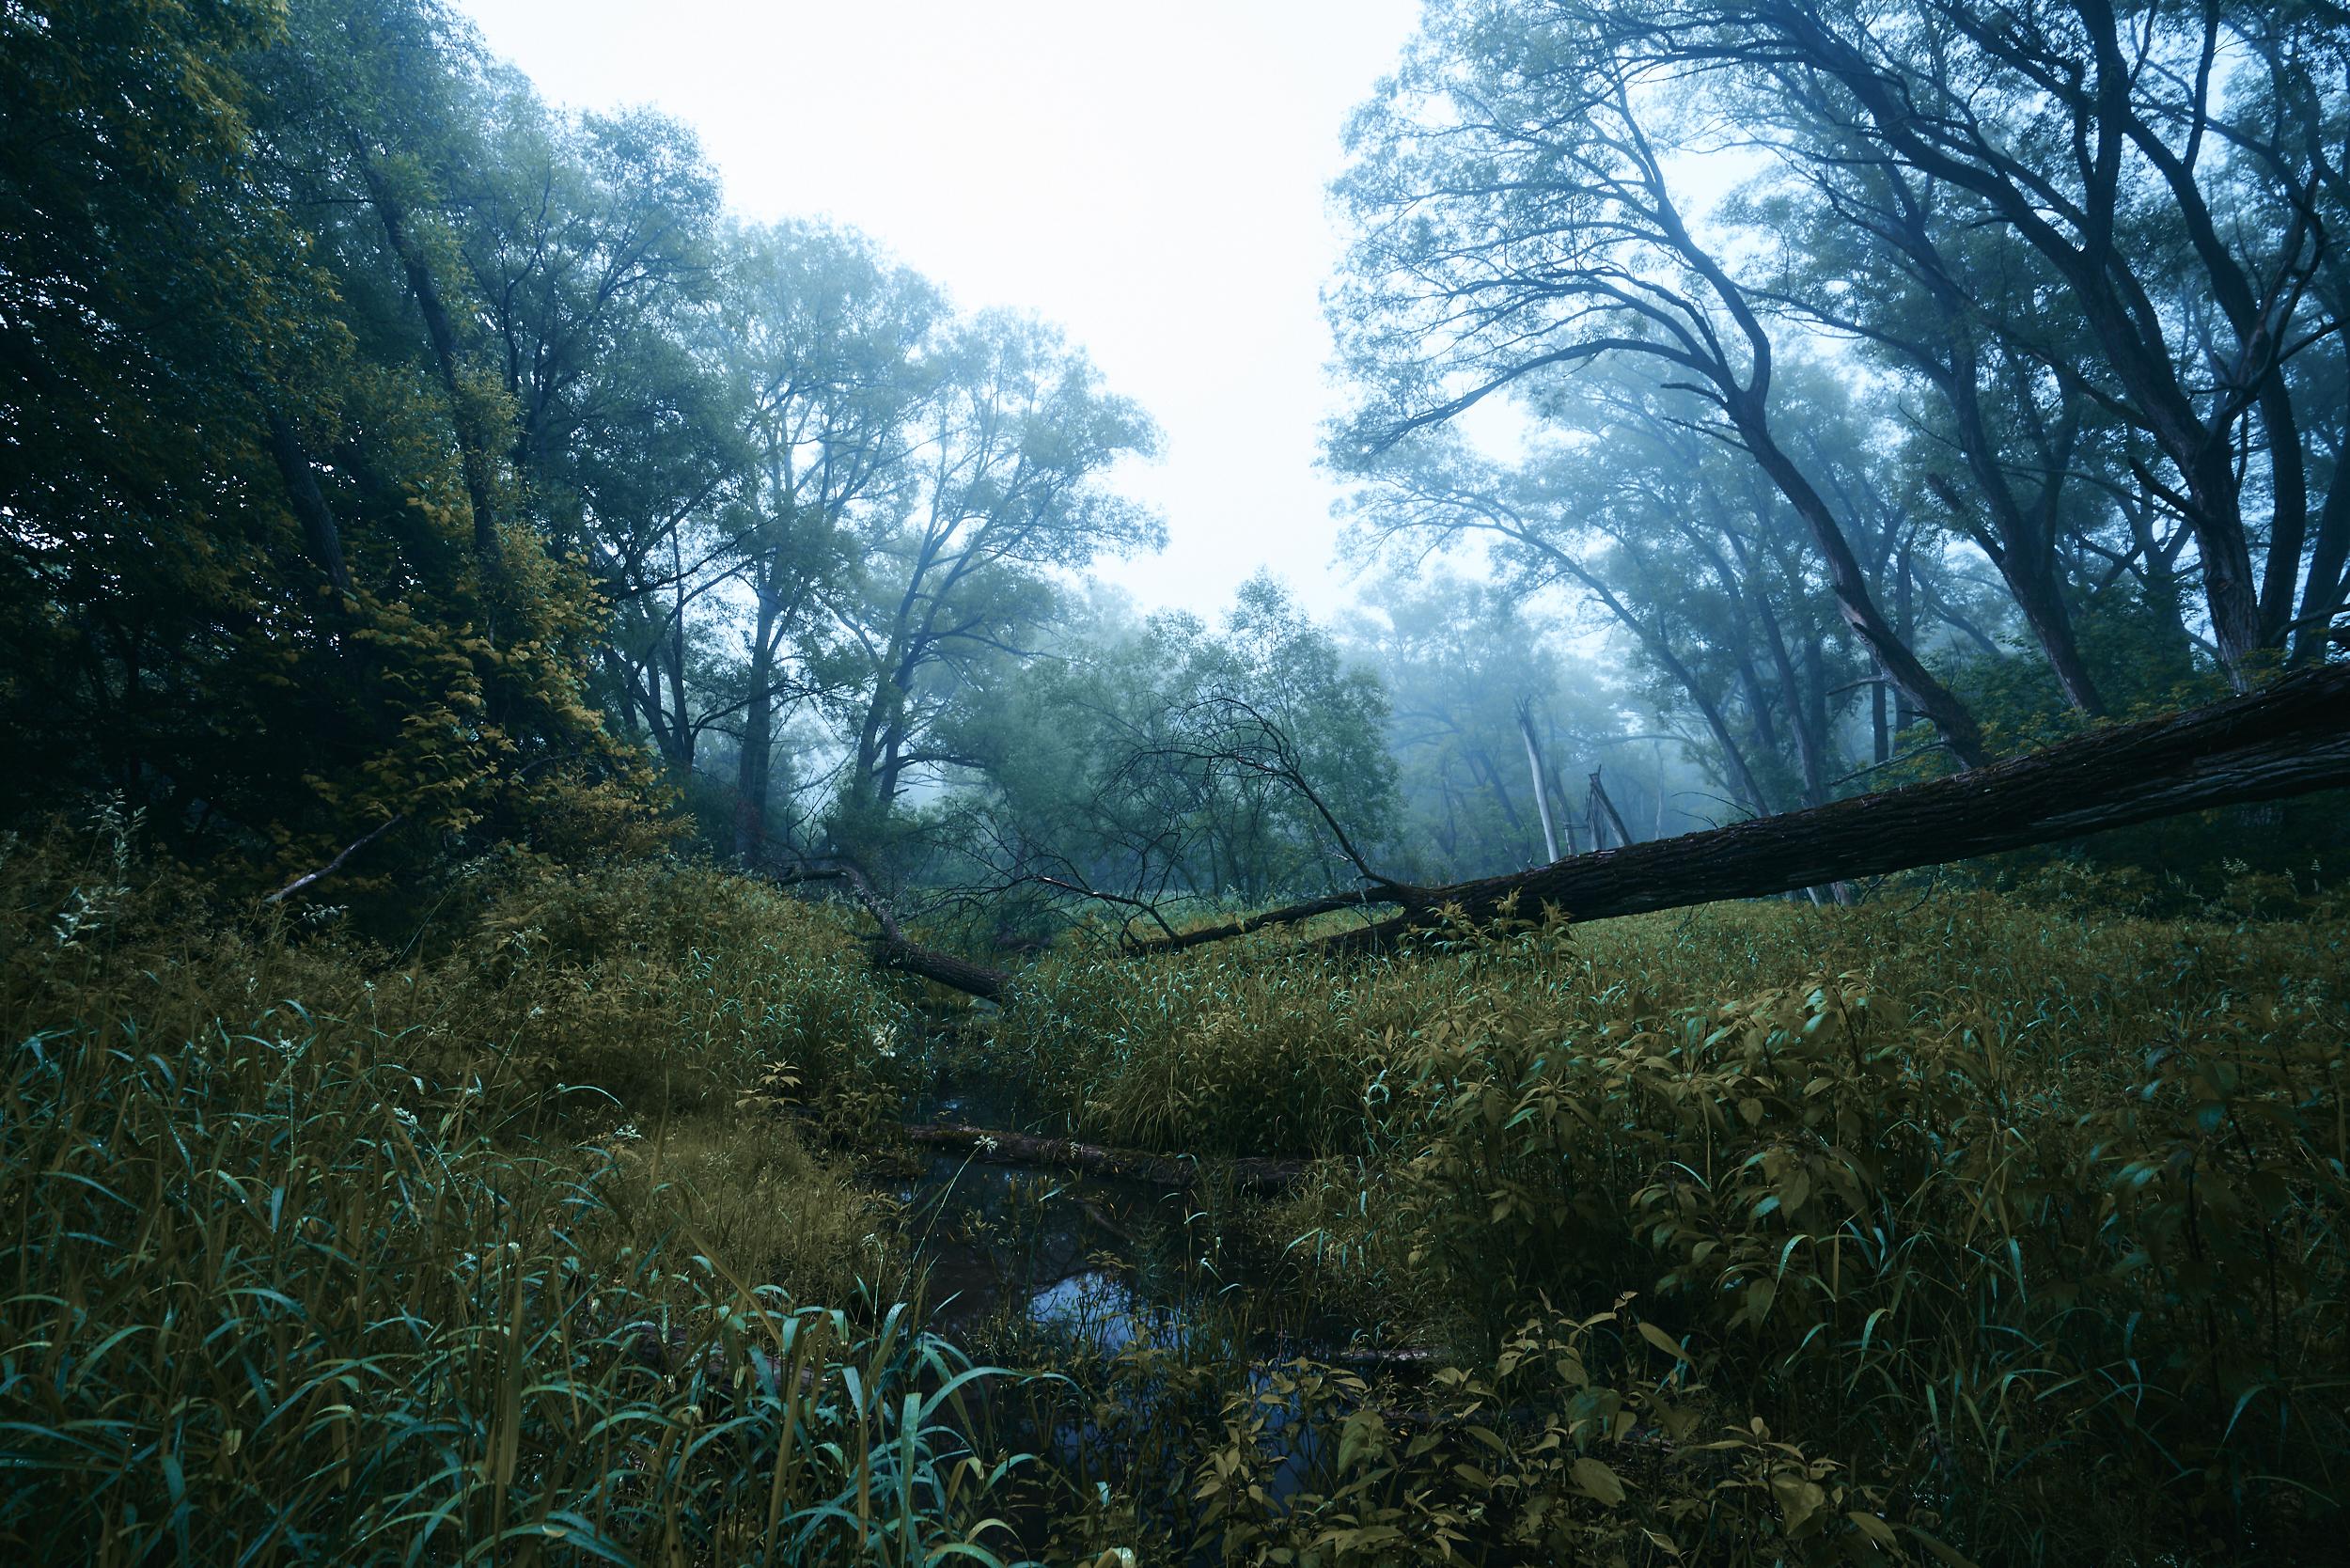 Nolan-Dubeau-Beaver-River-DSC09559.jpg